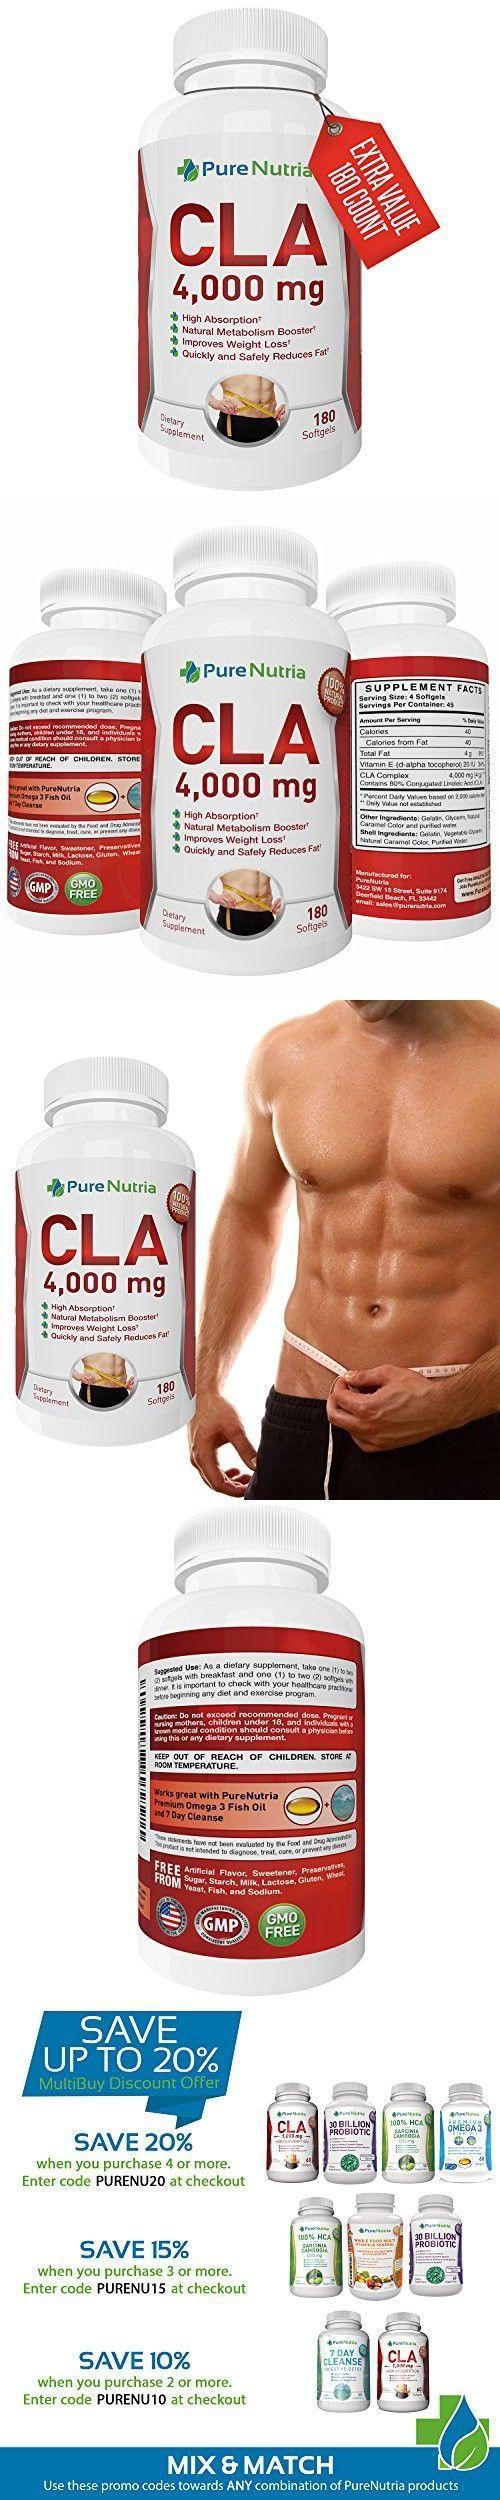 PureNutria Fat Burner CLA 4000mg Supplement for Weight Loss - Conjugated Linoleic Acid Softgels - Build Lean Muscle and Burn Belly Fat Fast (180 Softgels) #bellyfatburnersupplement